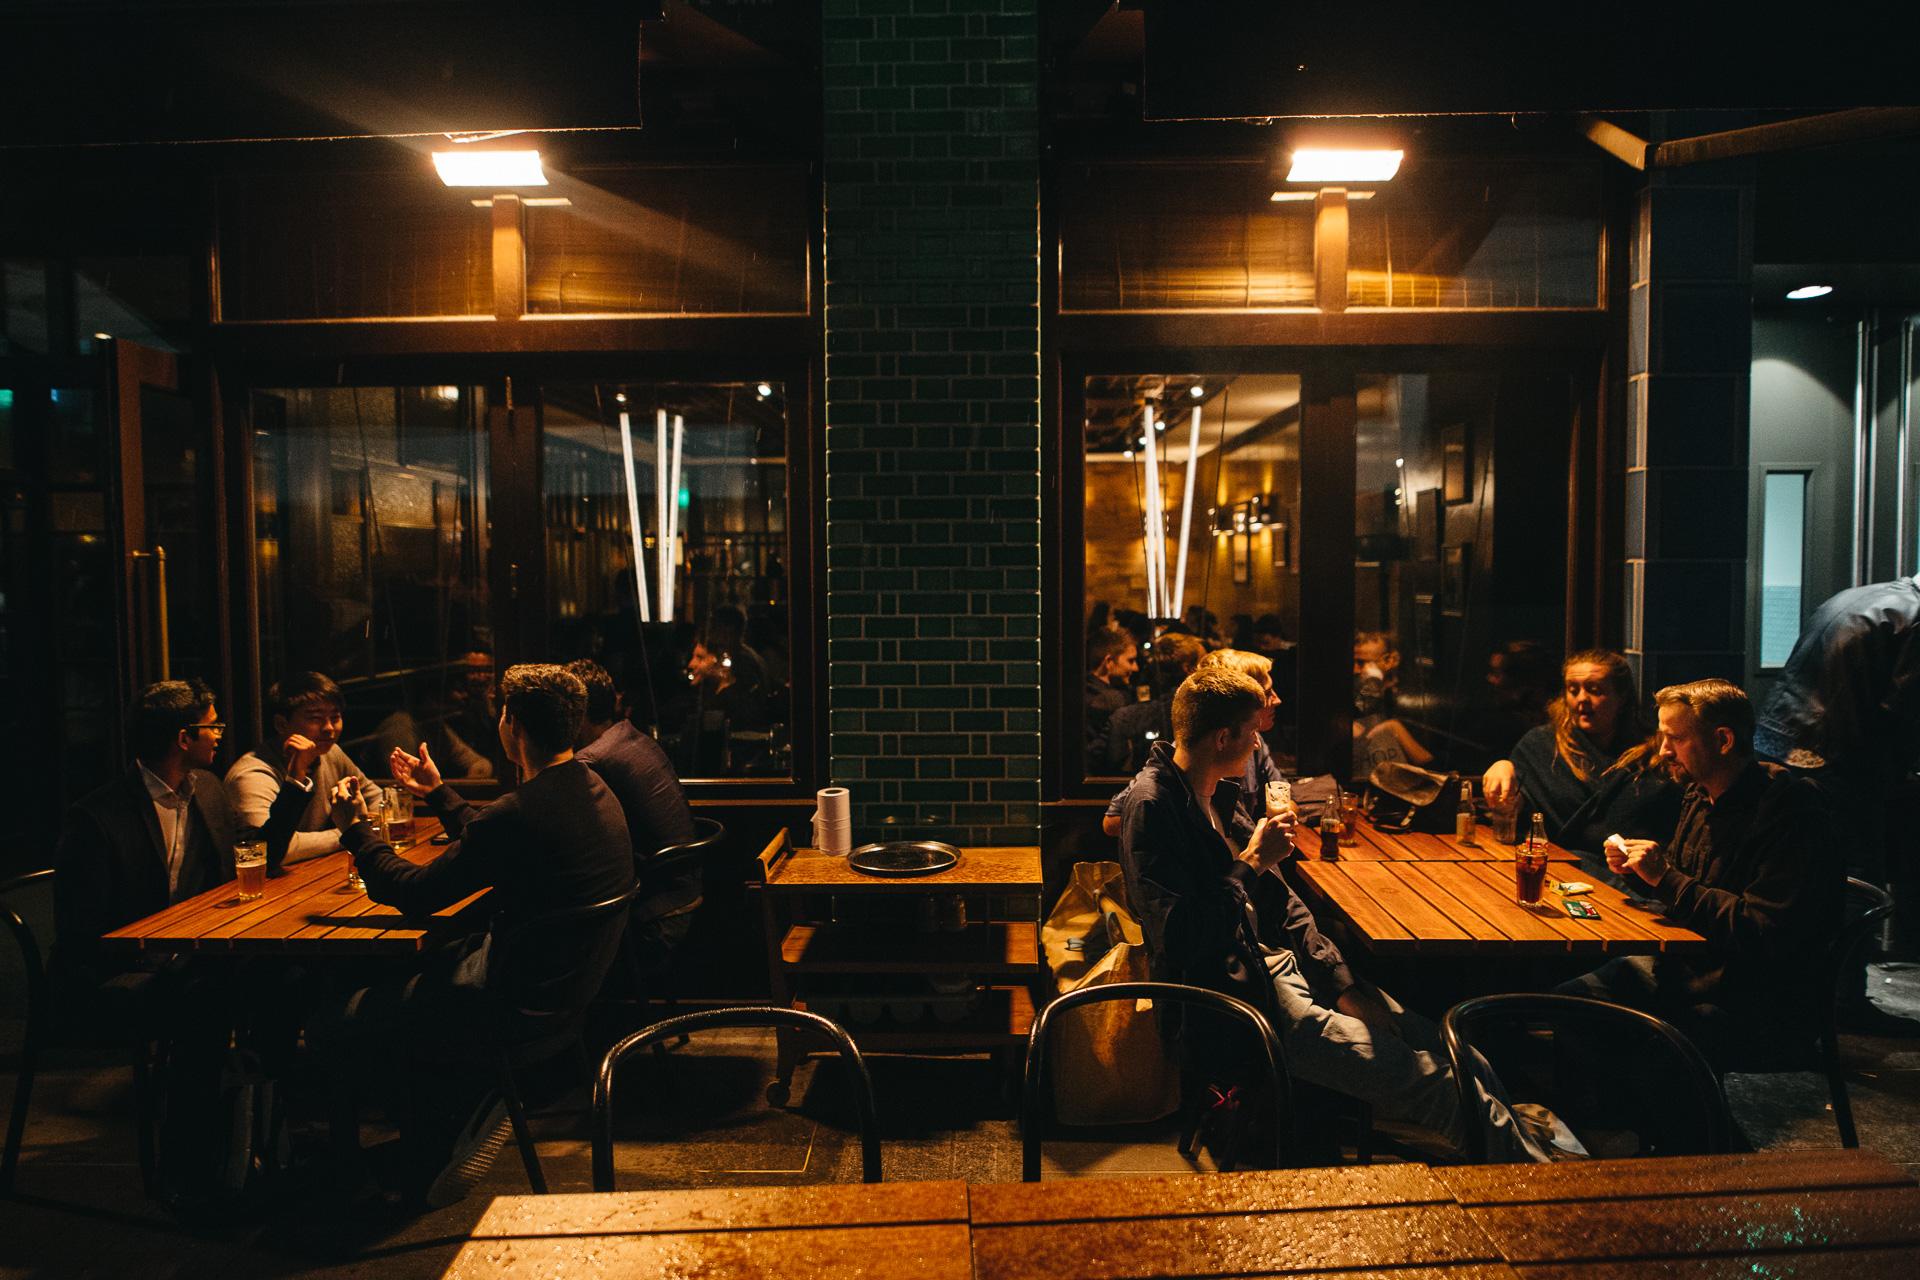 gabor_lenart_london_photographer_street_blogger_lifestyle_img_5170